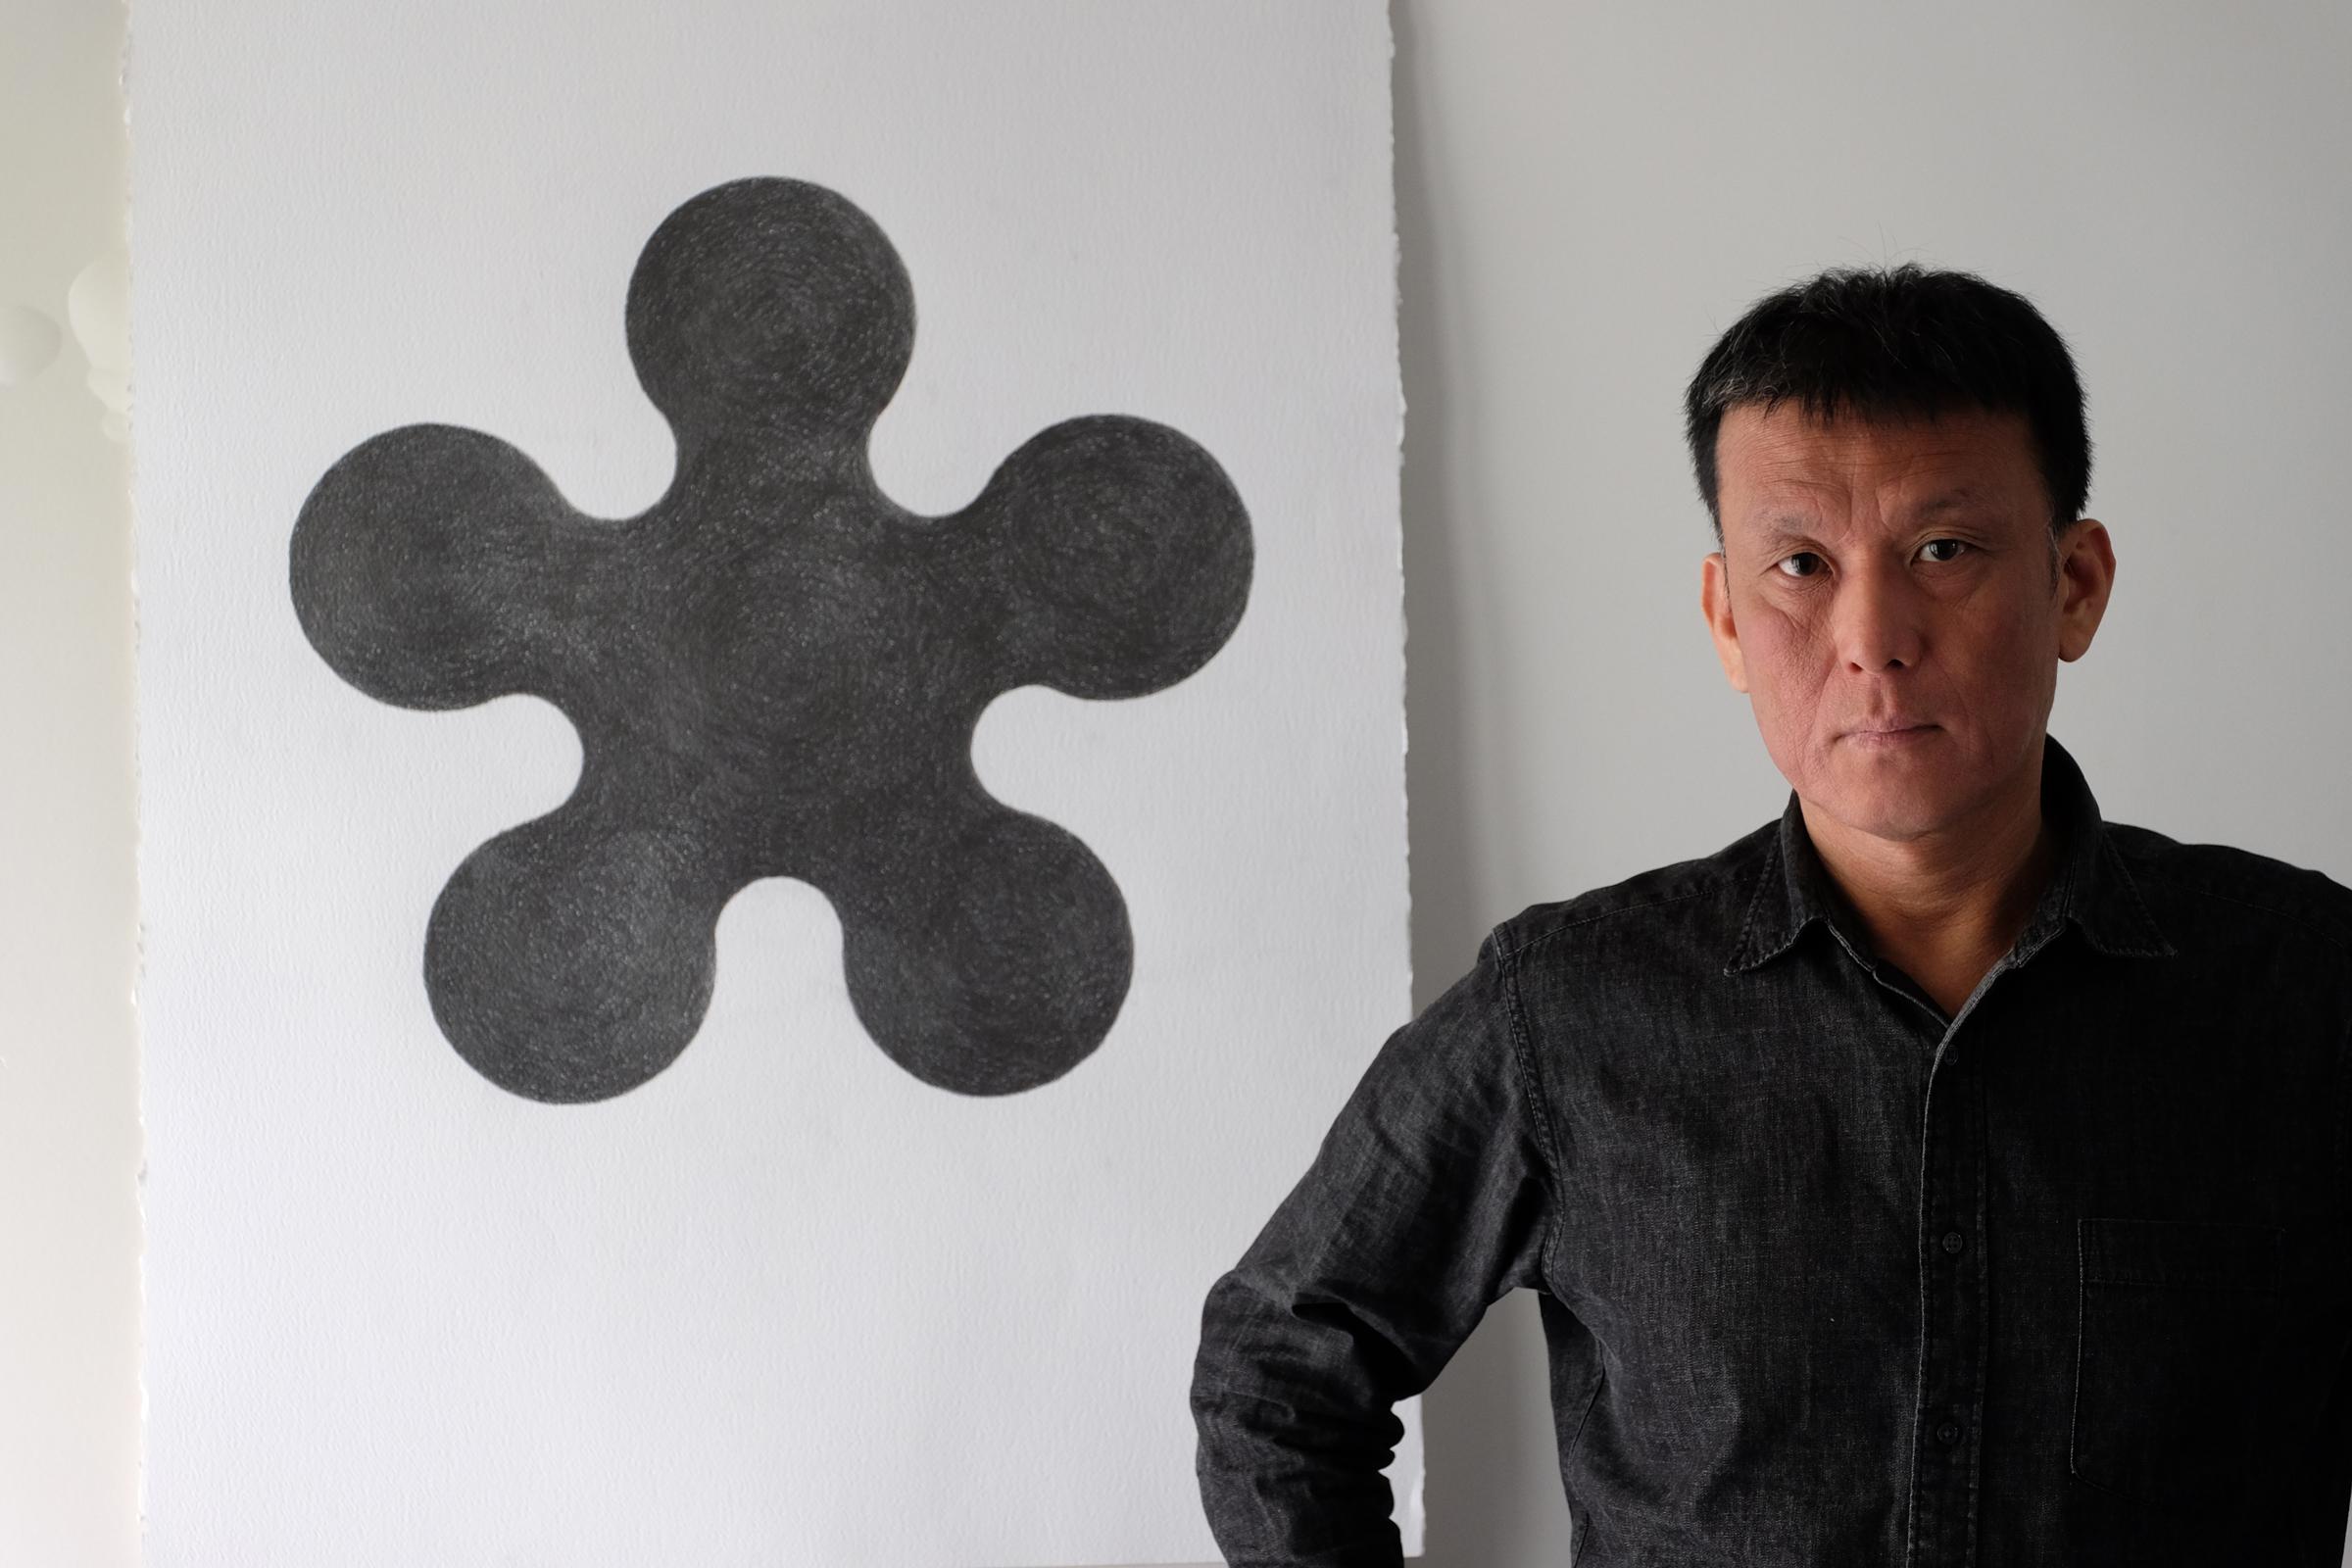 Masayuki-Koorida